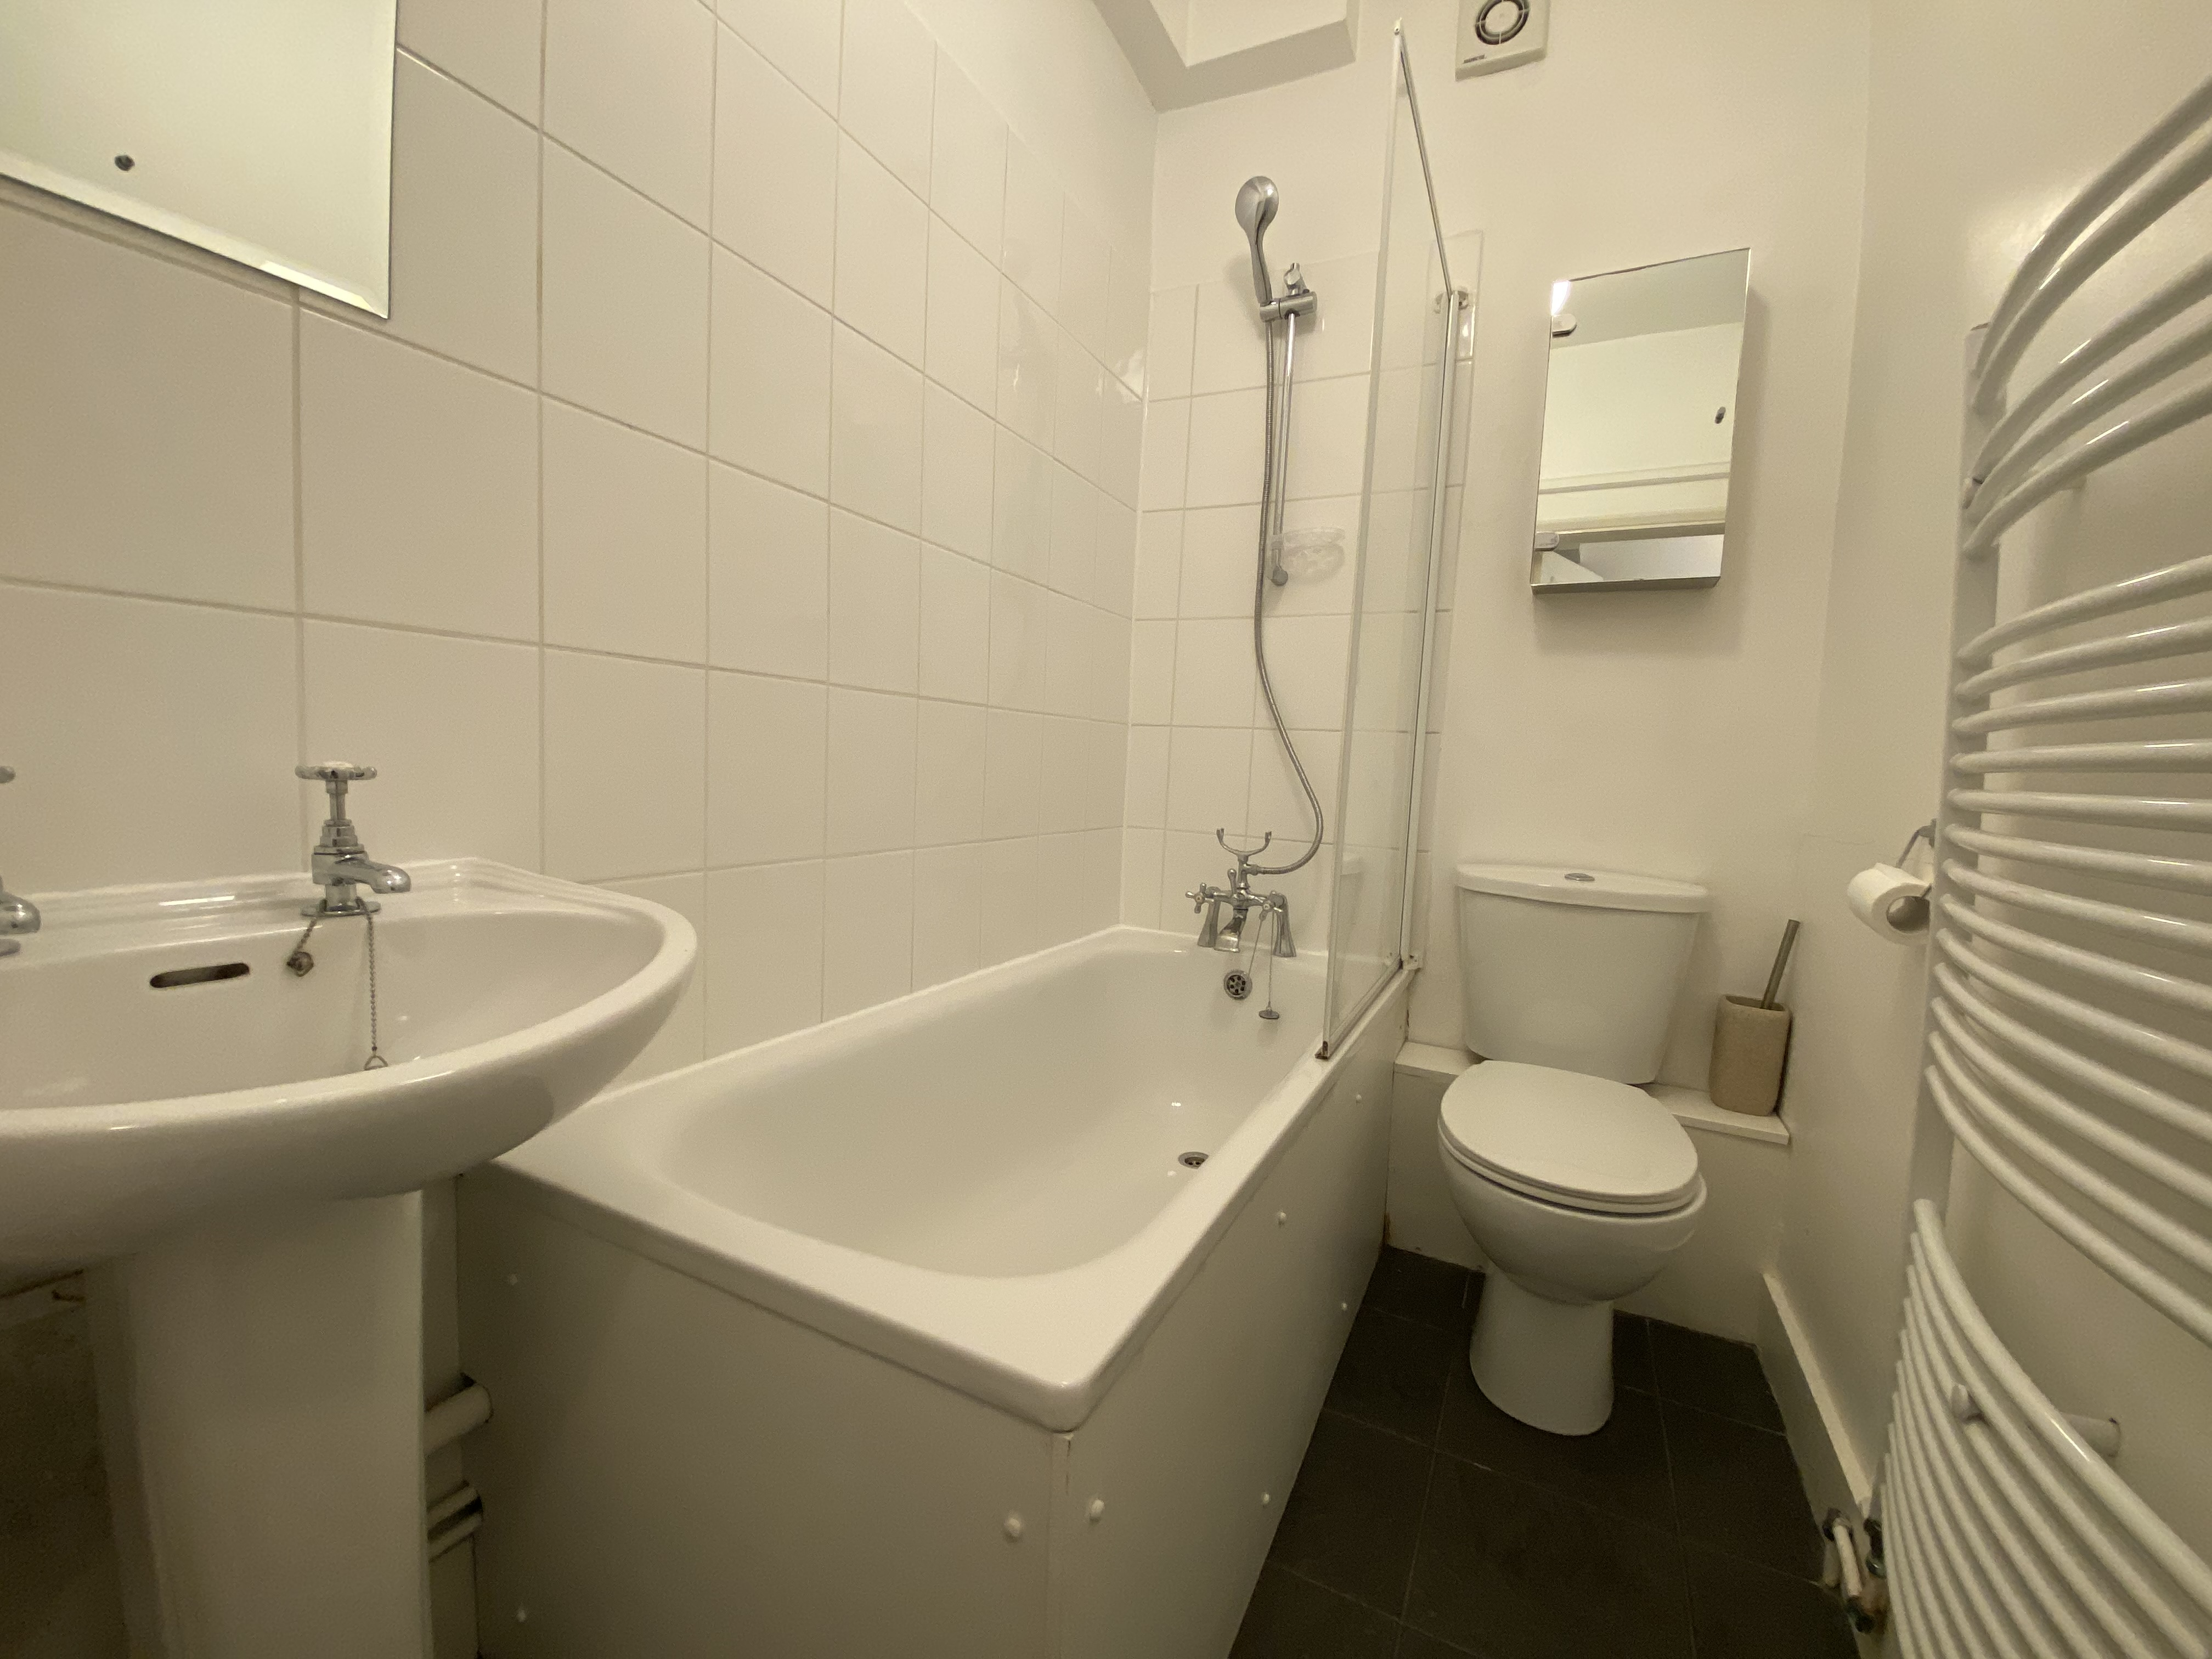 customer_1/branch_1/client_43229/sale_property/Bathroom_1617460013.jpeg